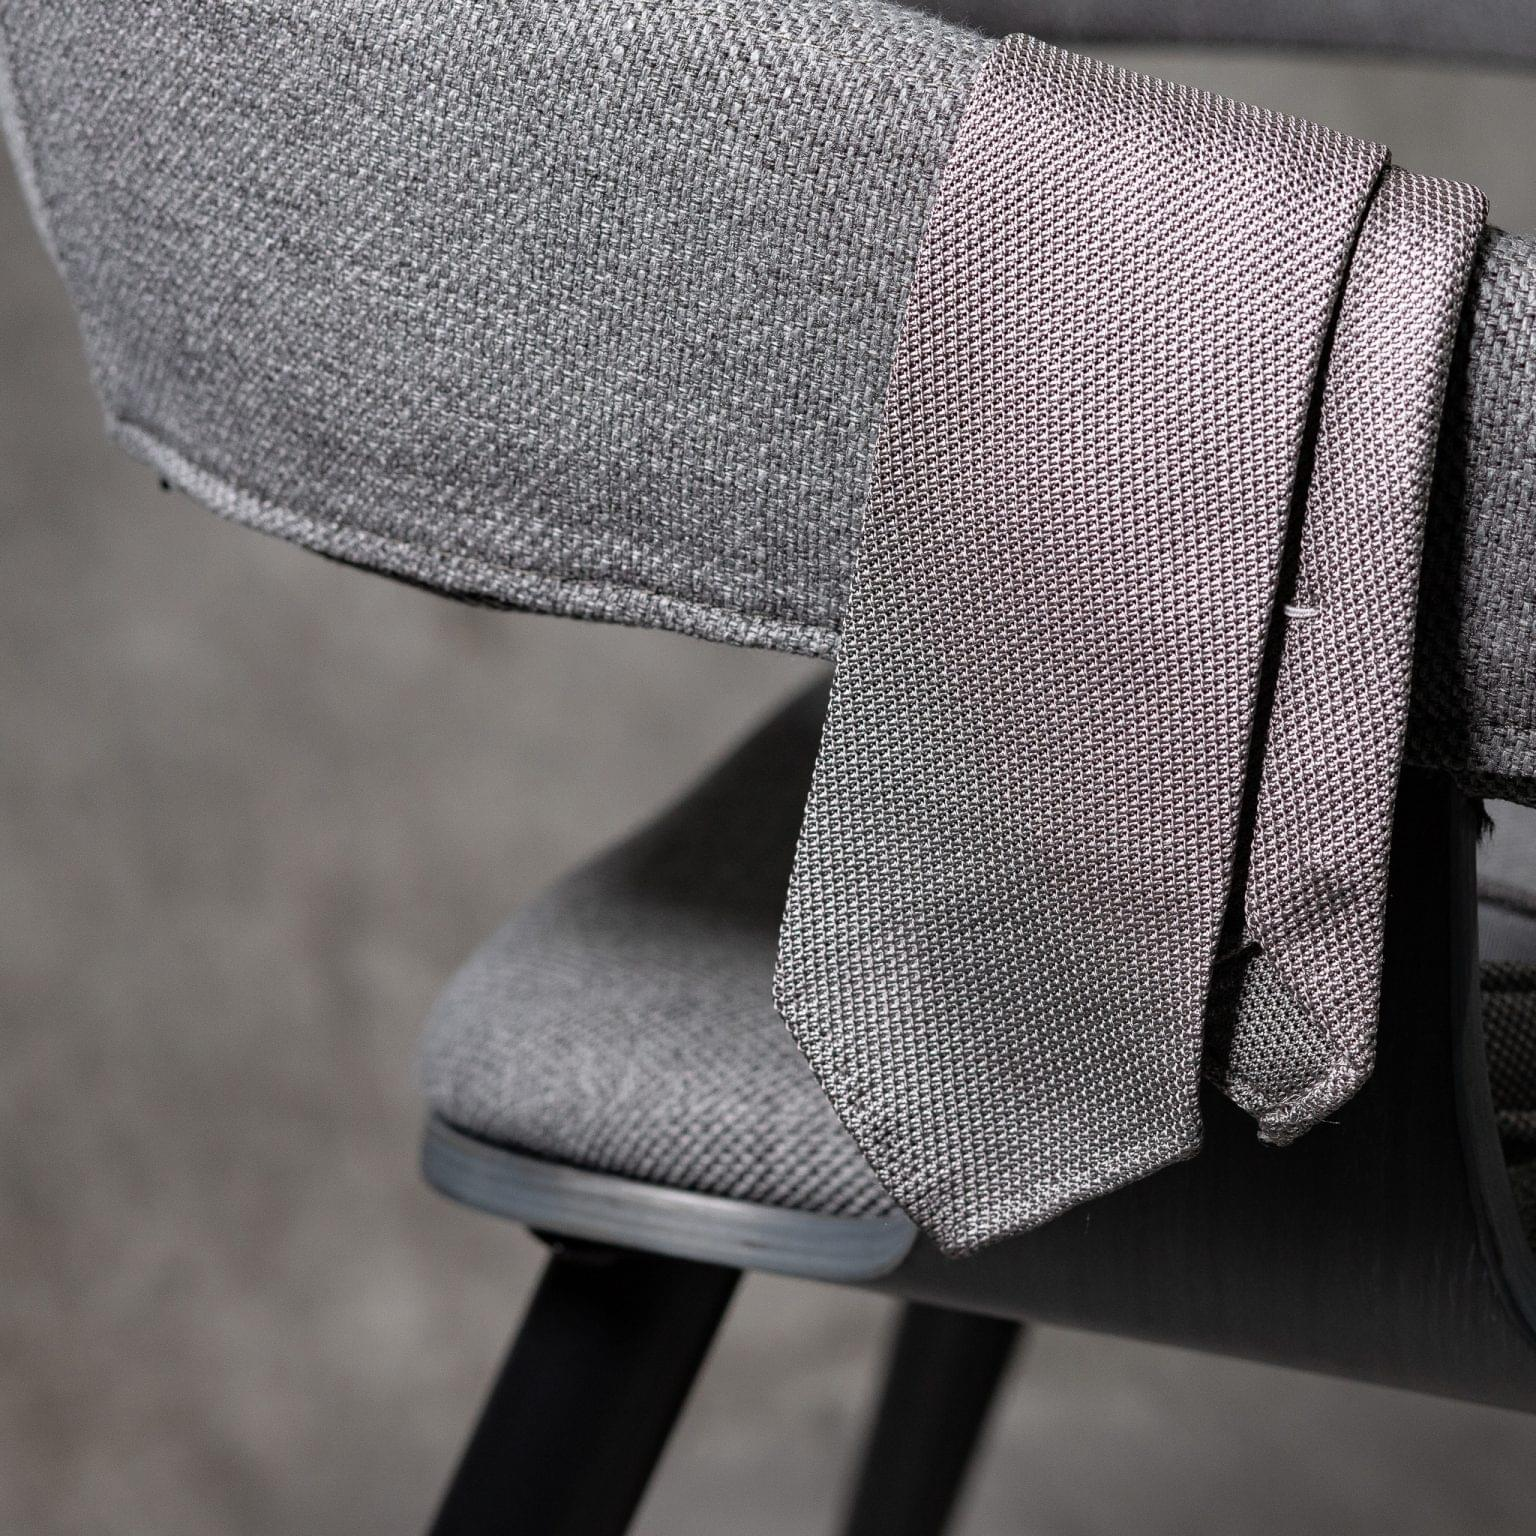 GRENADINE-0151-Tie-Initials-Corbata-Iniciales-The-Seelk-2